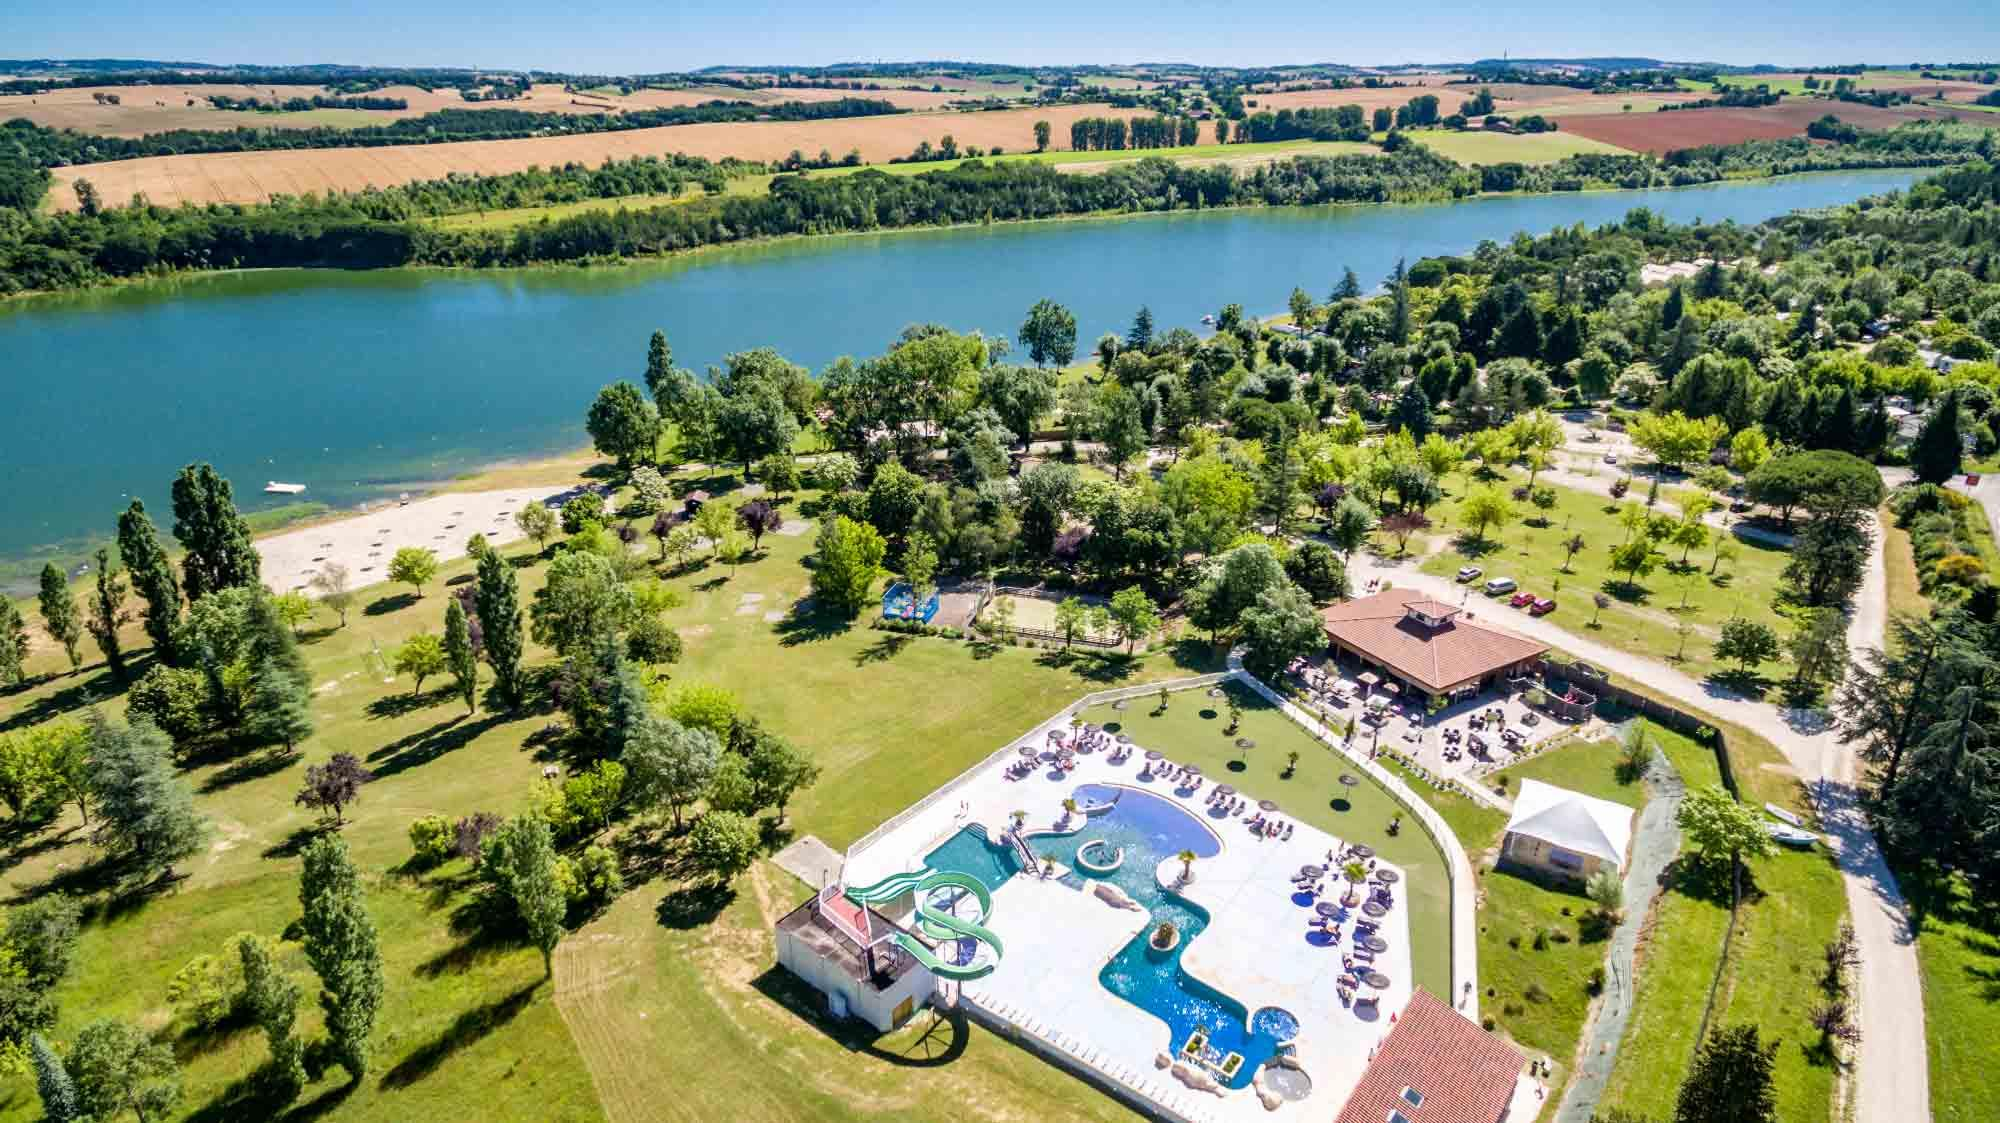 Camping Lac de Thoux St-Cricq, Thoux, Gers